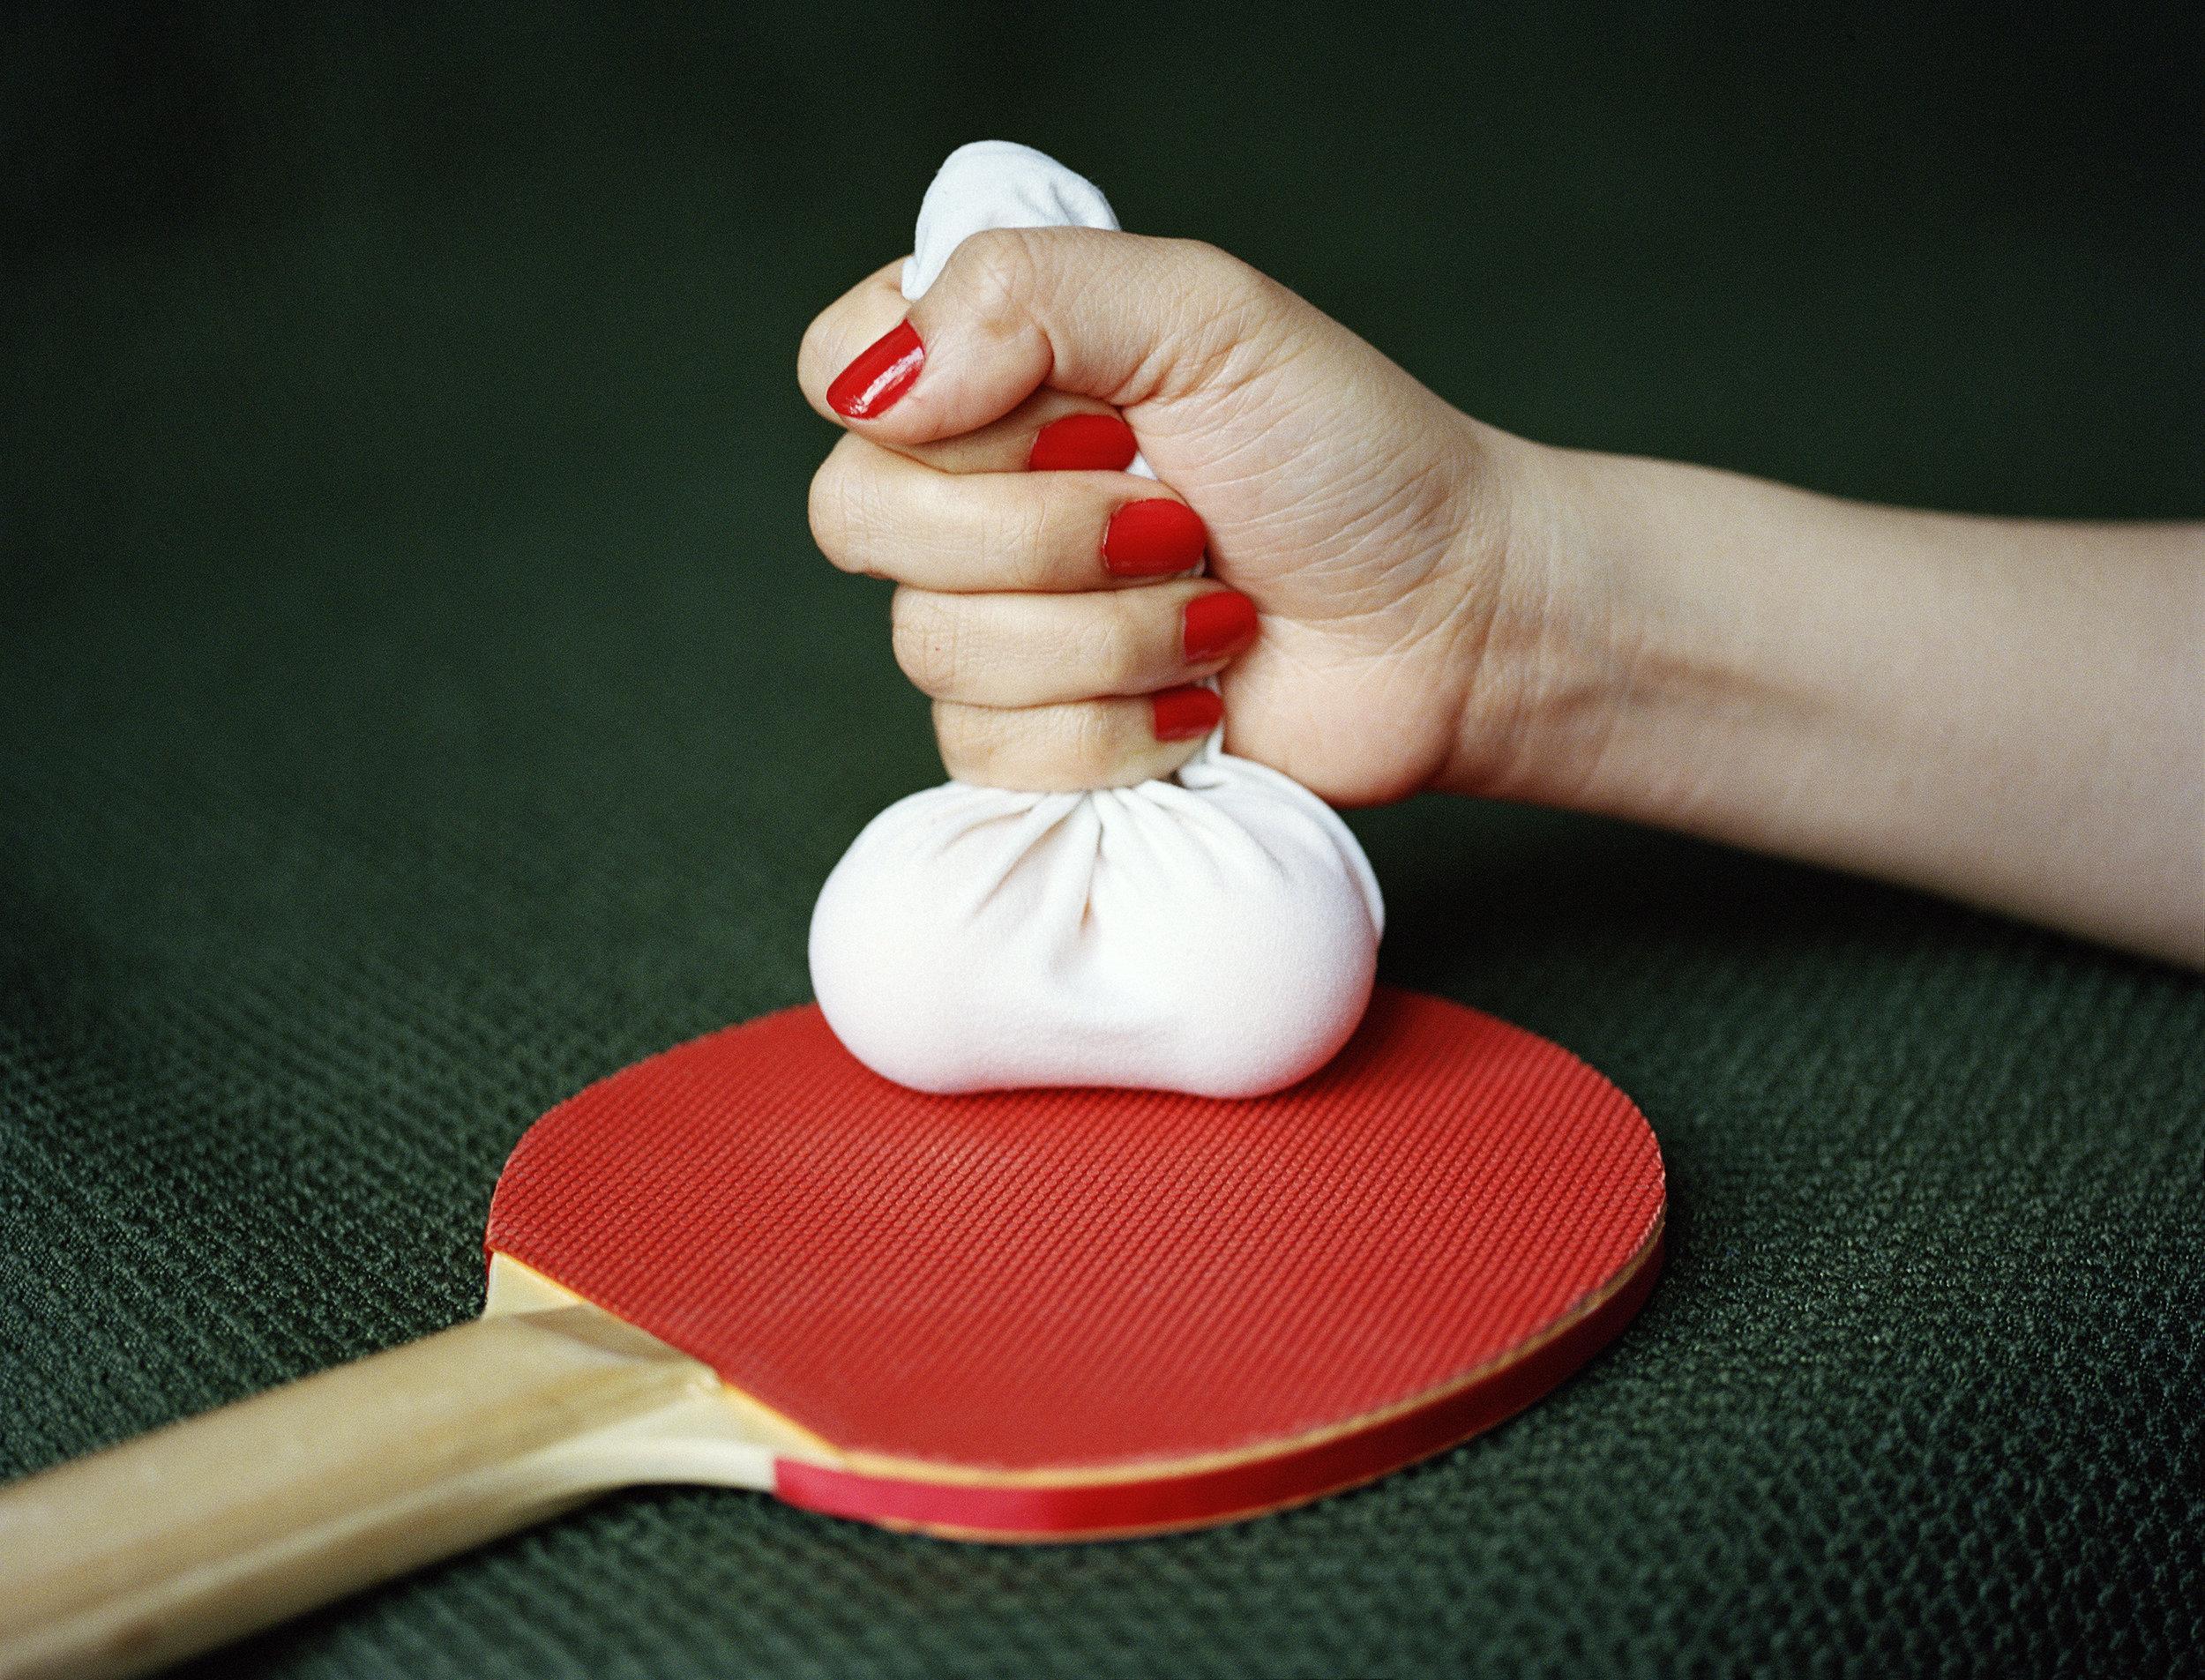 liao_2013_ping pong balls.jpg